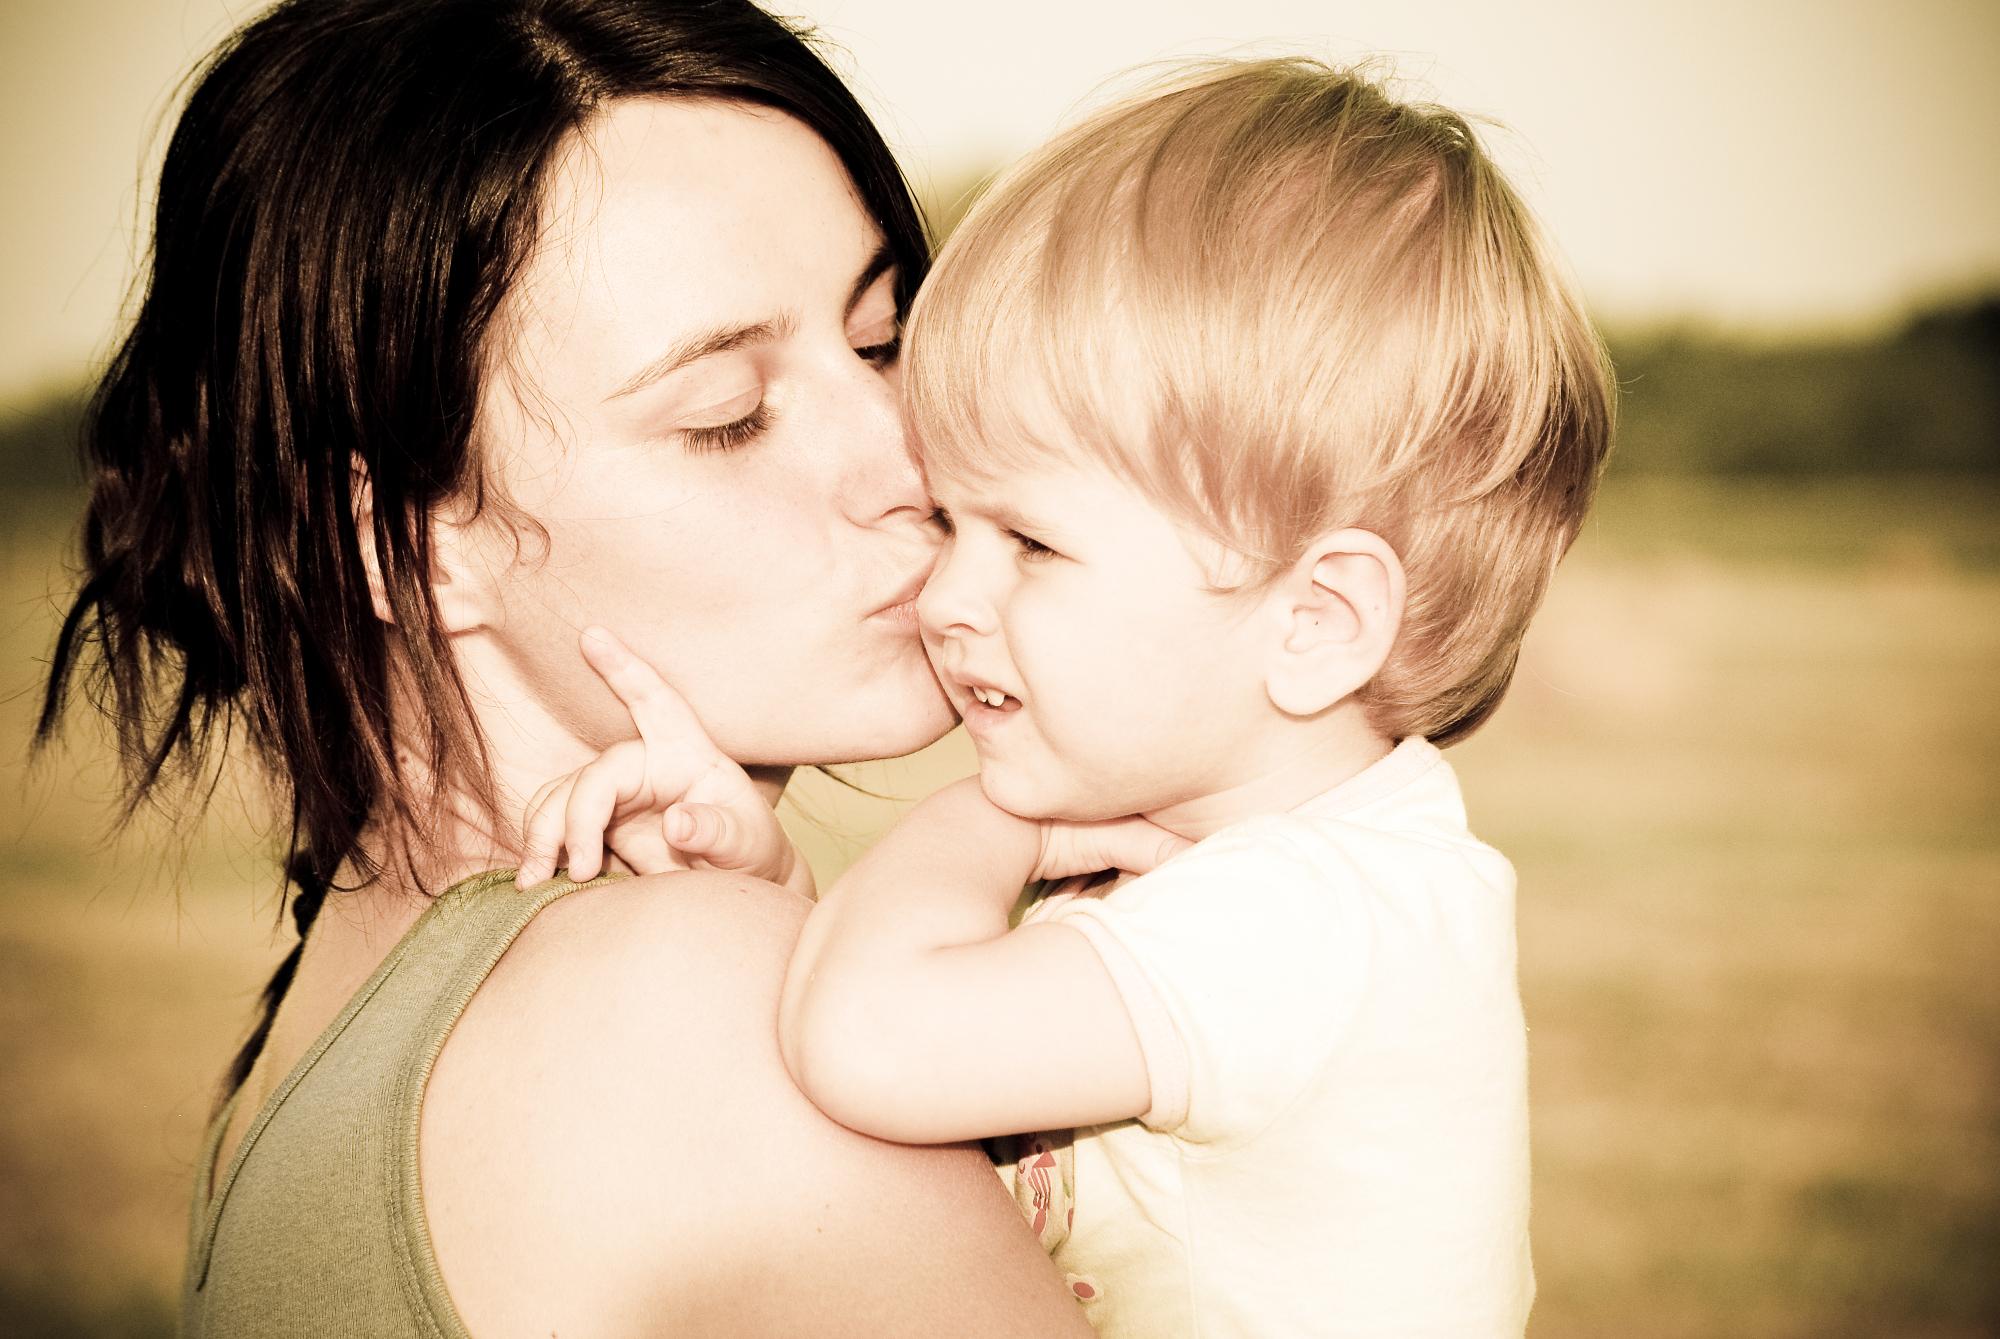 mom_child_2.jpg